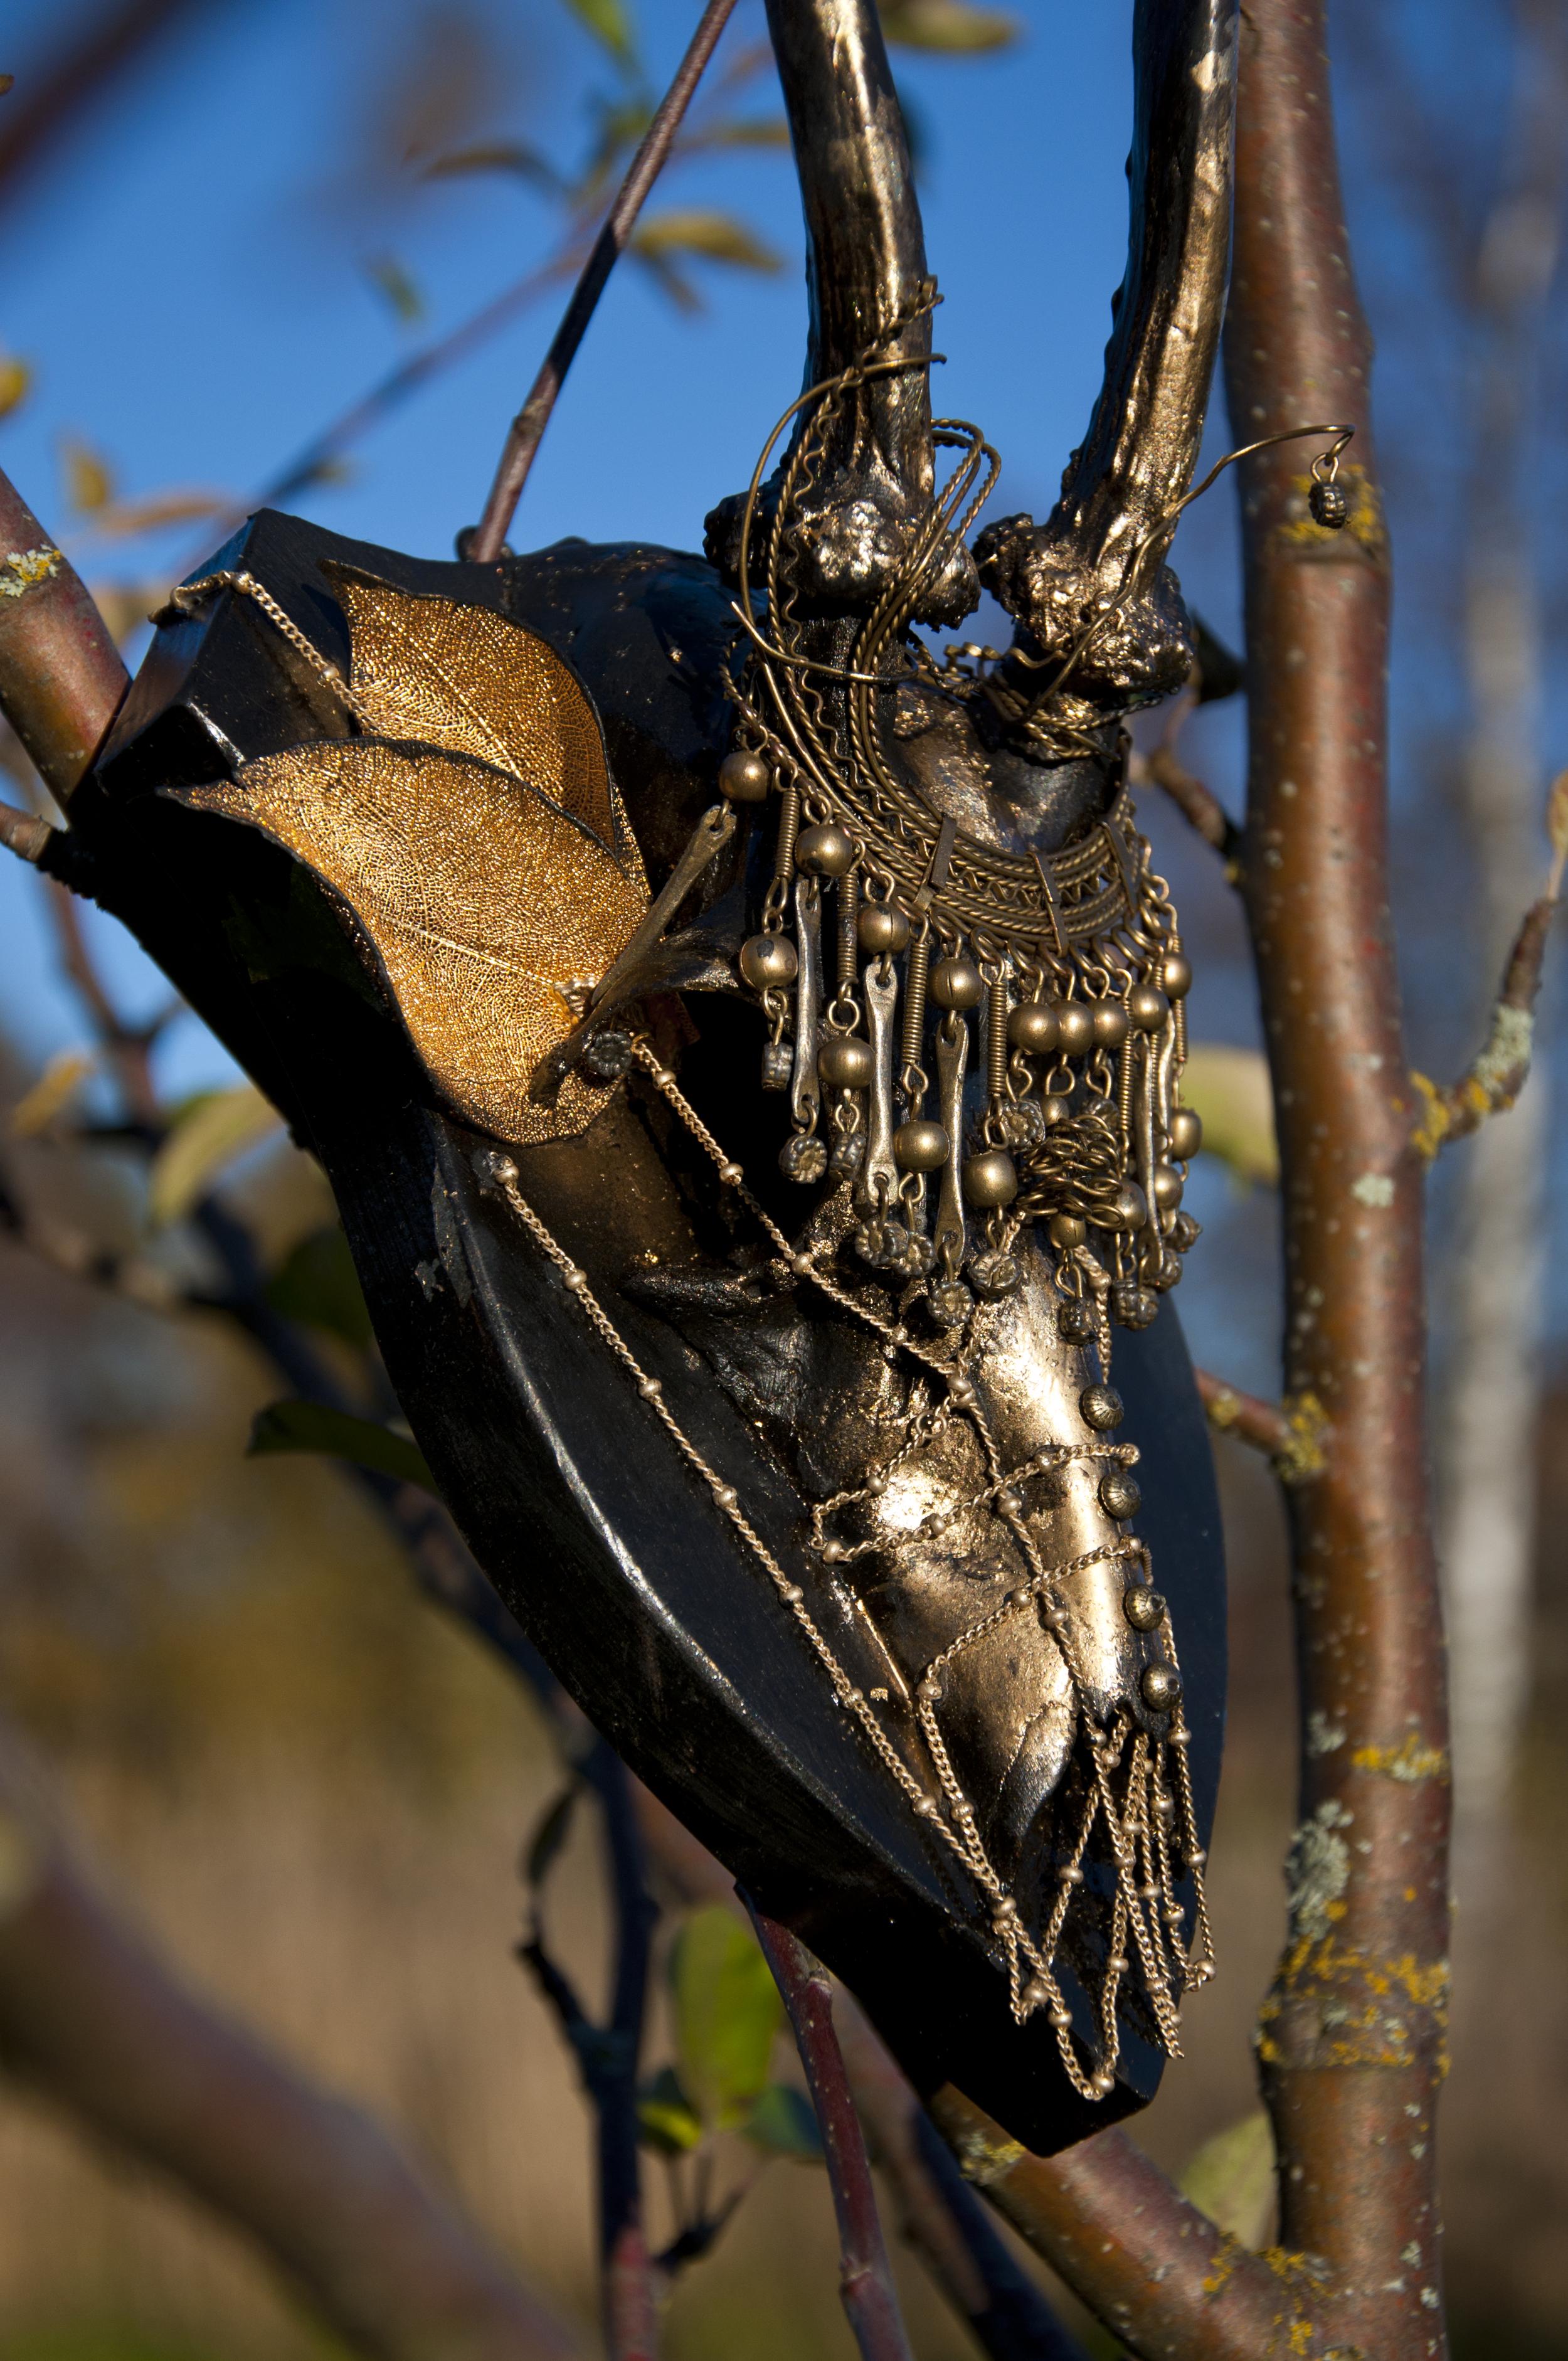 petra-shara-stoor-skull-art-myxh-3.png